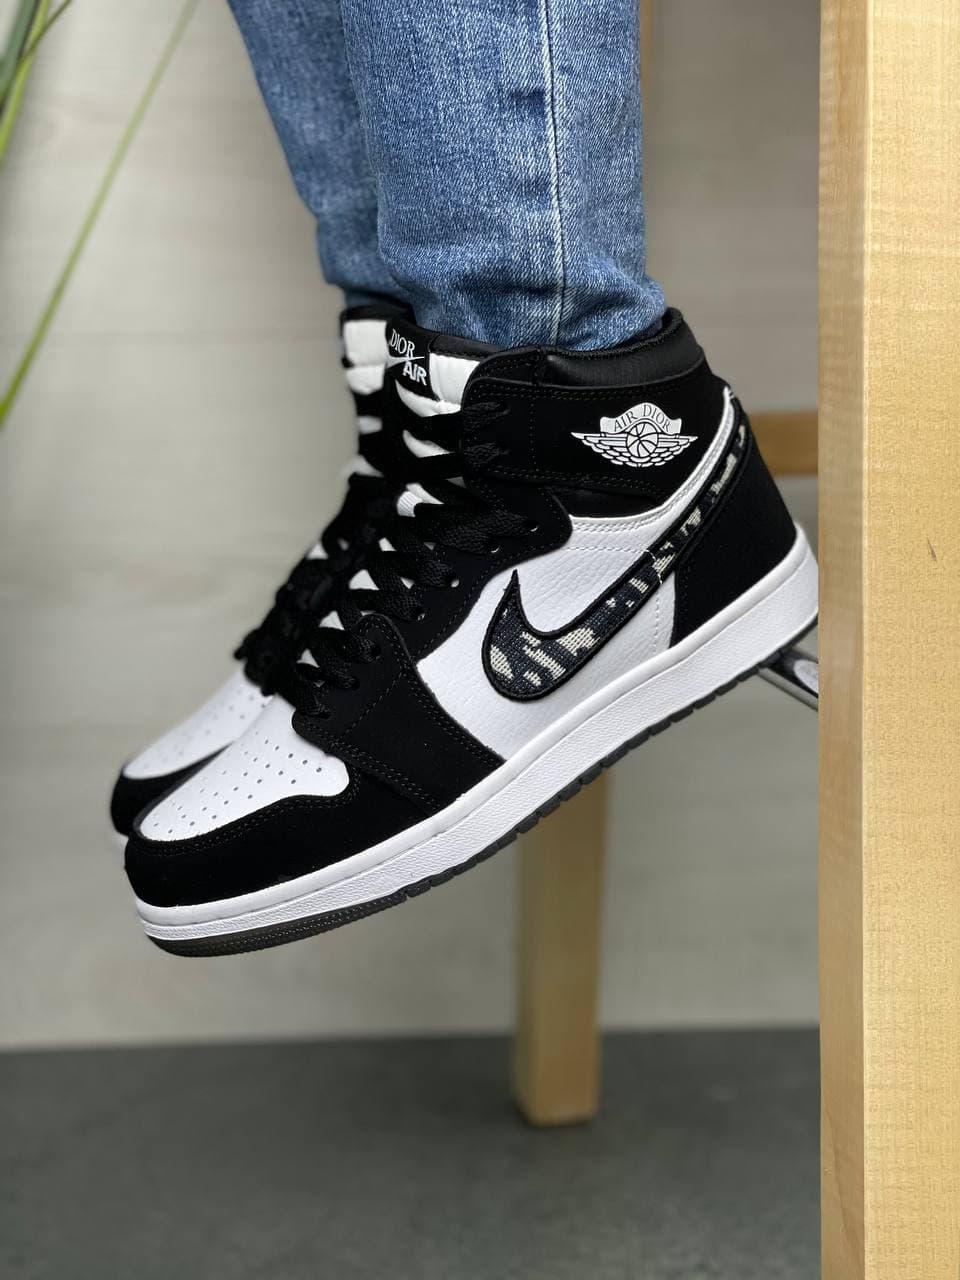 Женские кроссовки Nk ir Jordan  1 High х Dior Black/White